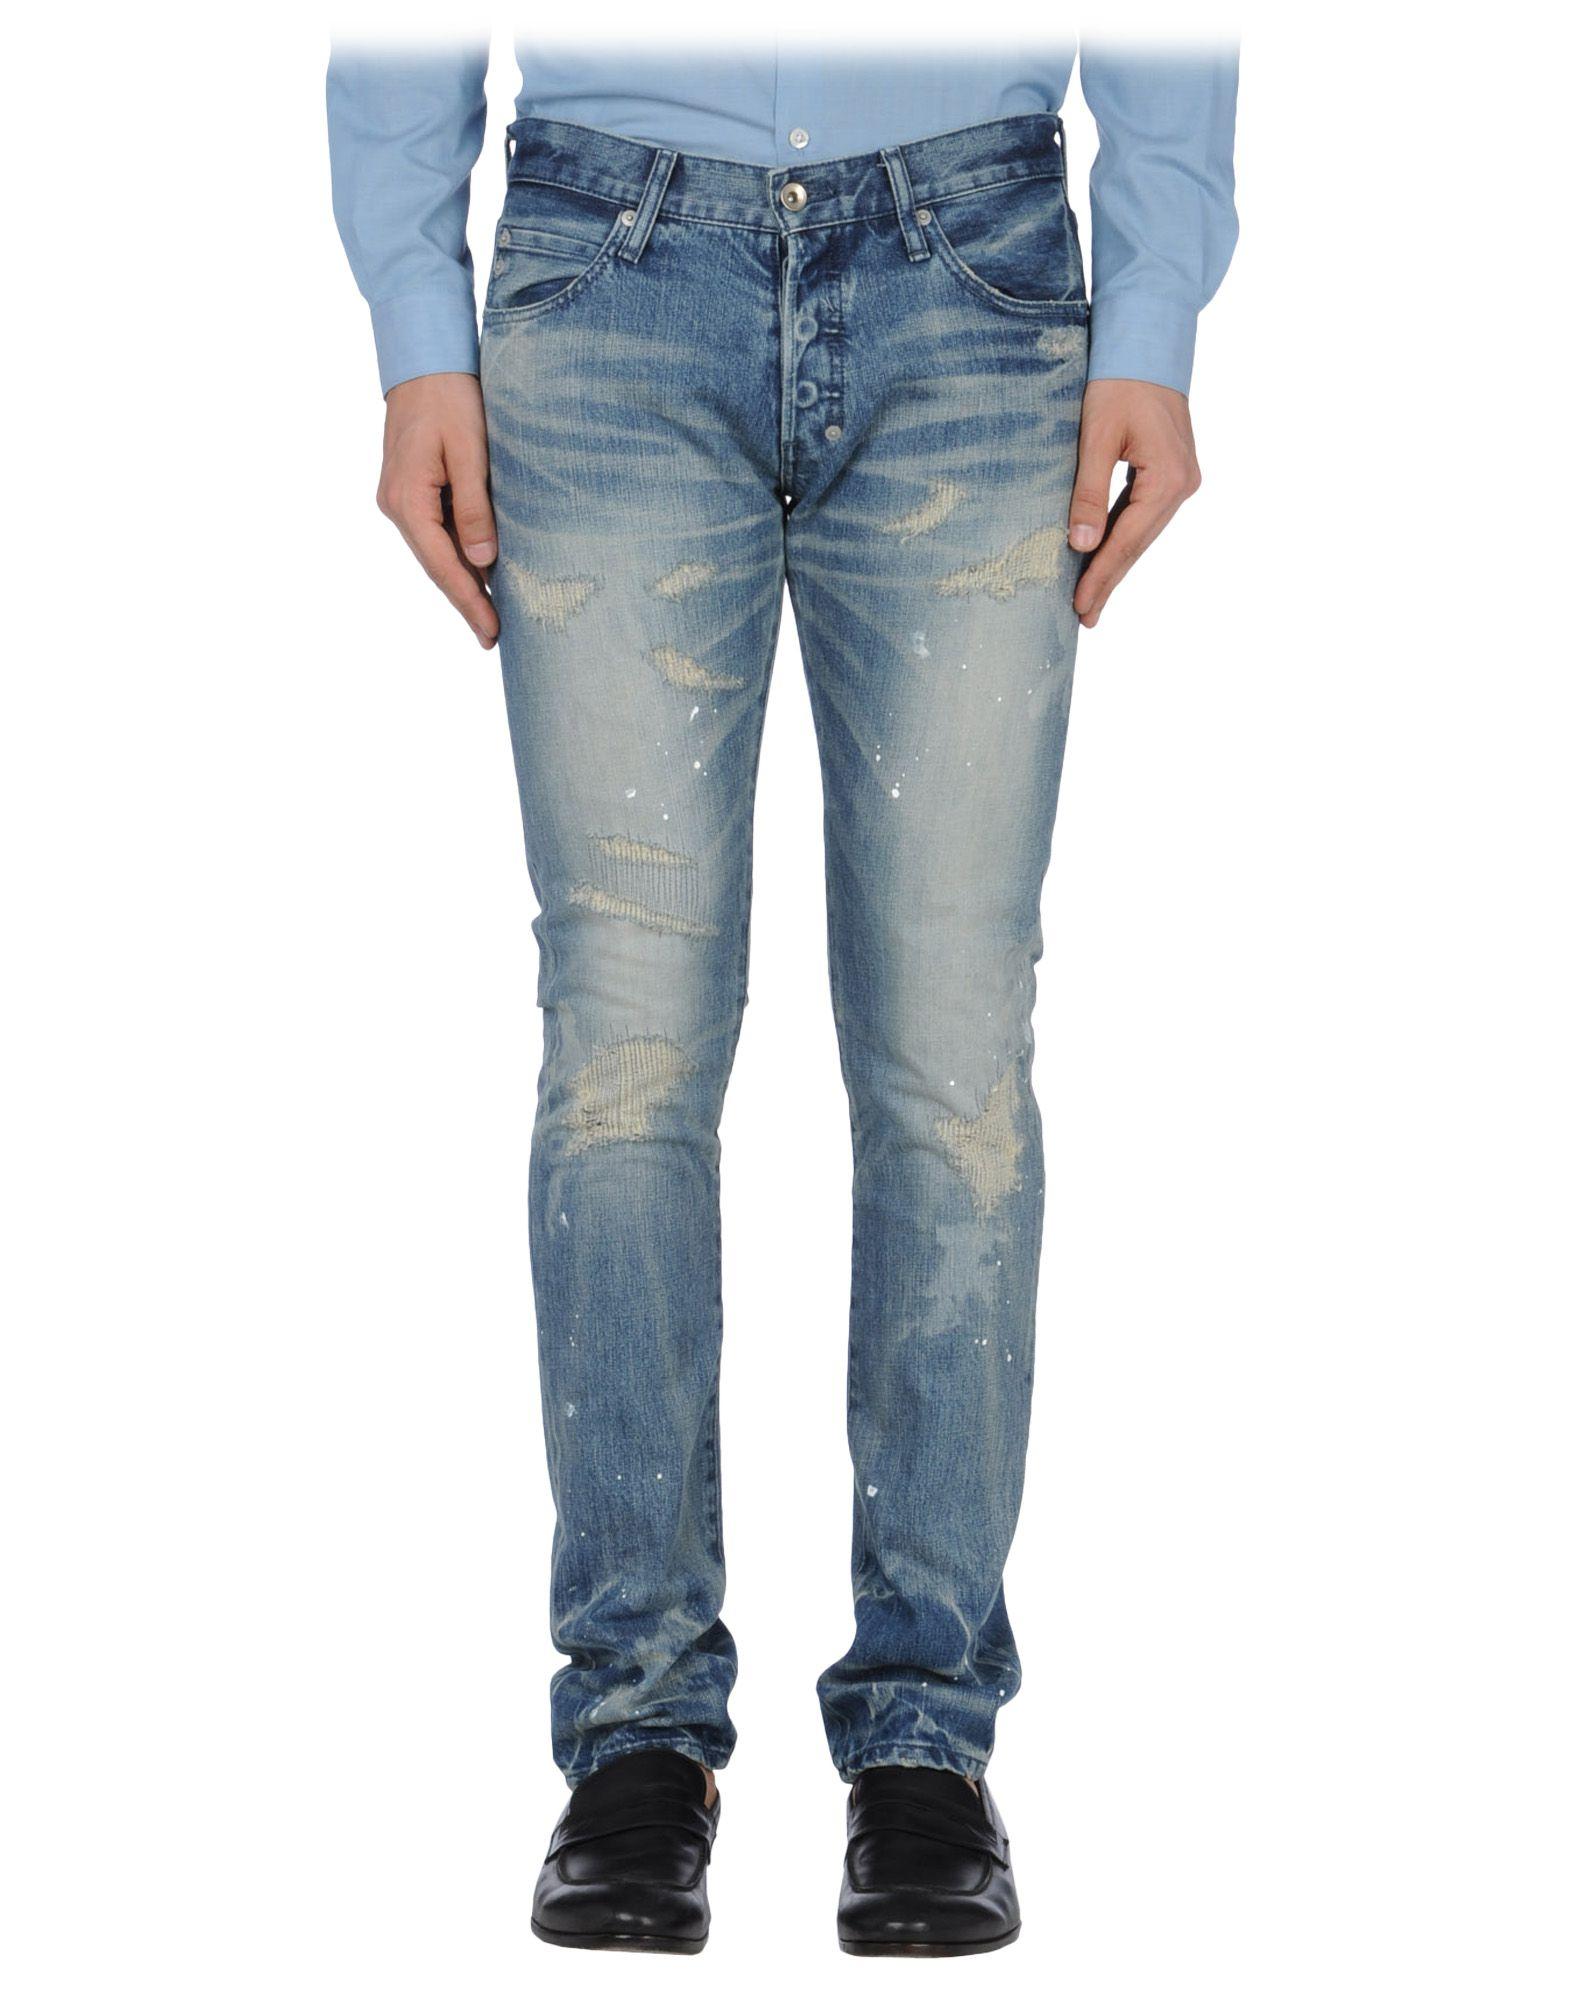 Pantaloni Jeans Headl_Iner Uomo - Acquista online su